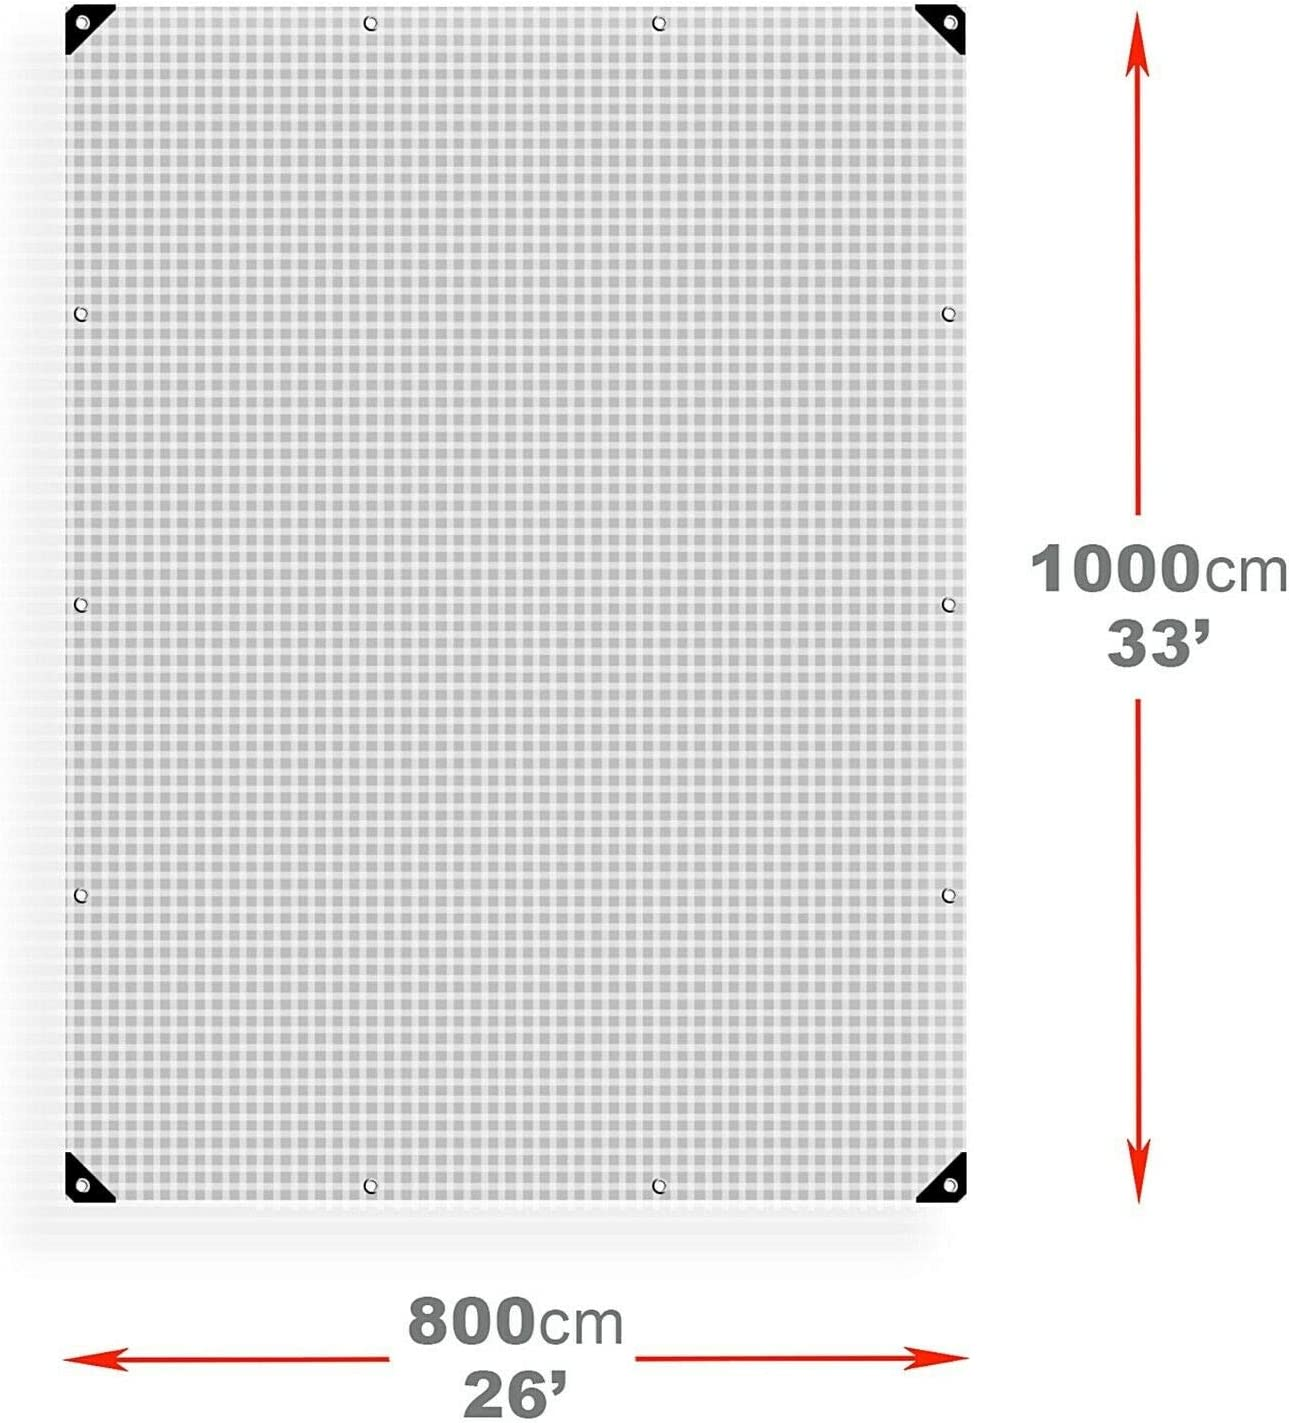 Premium Quality Cover Made of 100 gram//Square metre Tarpaulin Nylon Weave,Eyelets, 3 x 3 m // 9.8 x 9.8 ft Universal Tarp Sheet Agritrade AK Tarpaulin Waterproof Heavy Duty